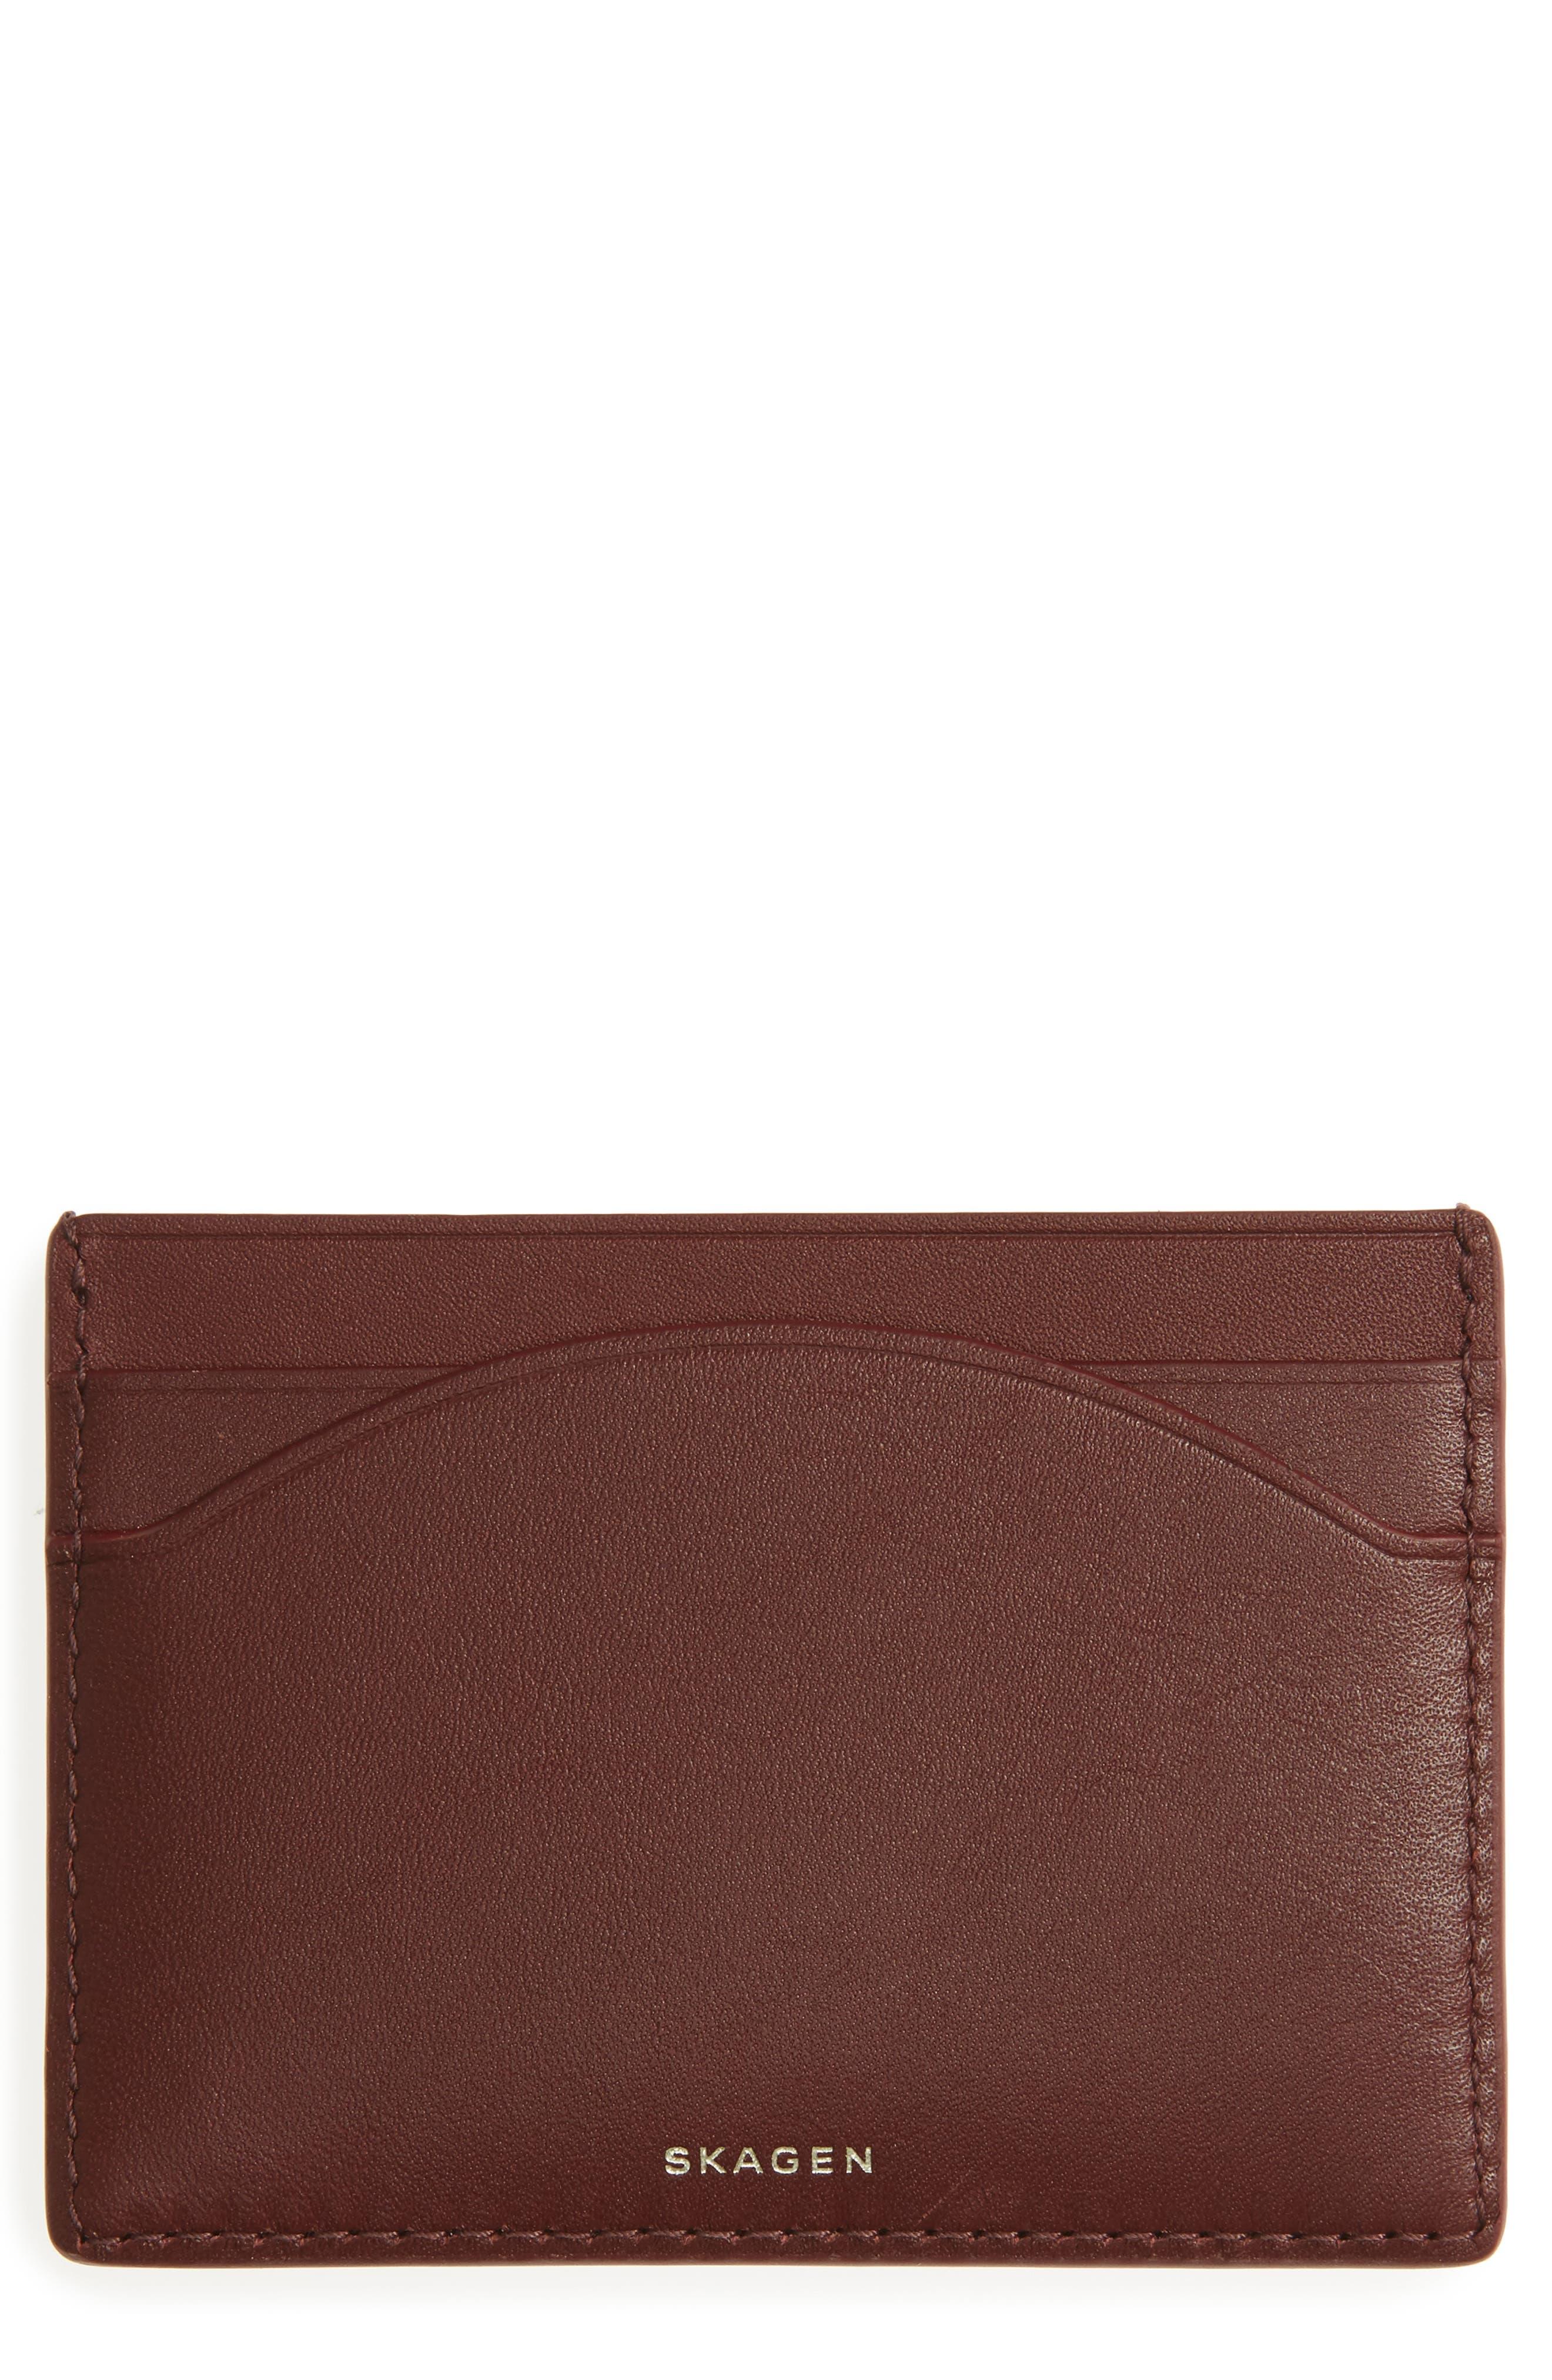 Alternate Image 1 Selected - Skagen Leather Card Case